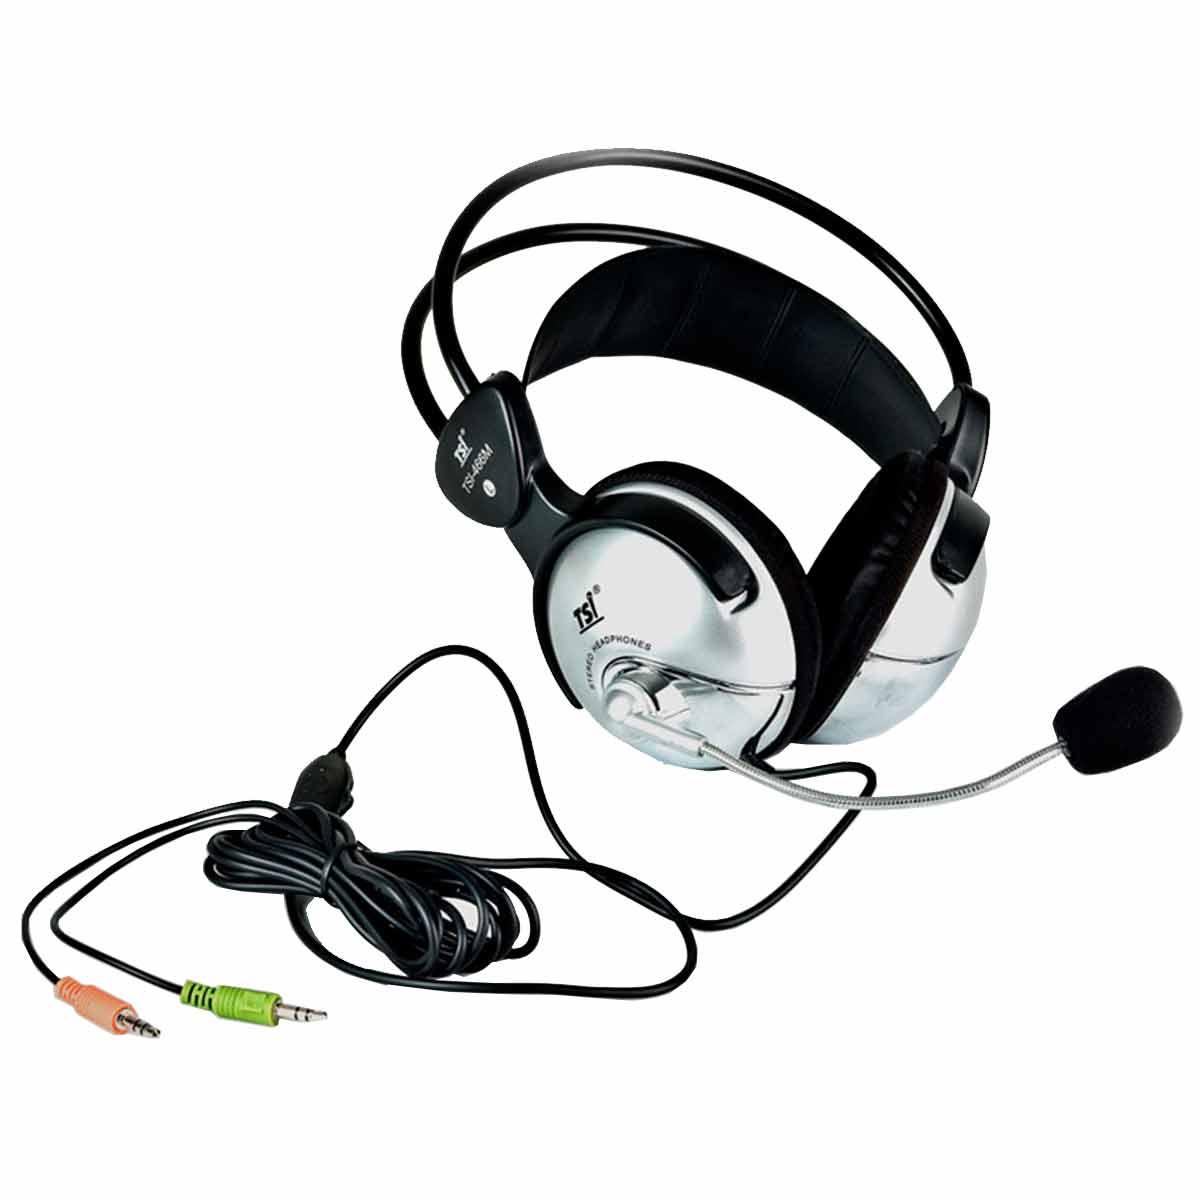 Fone de Ouvido Over-ear c/ Microfone 20 Hz - 20 KHz 32 Ohms - 20466 M TSI